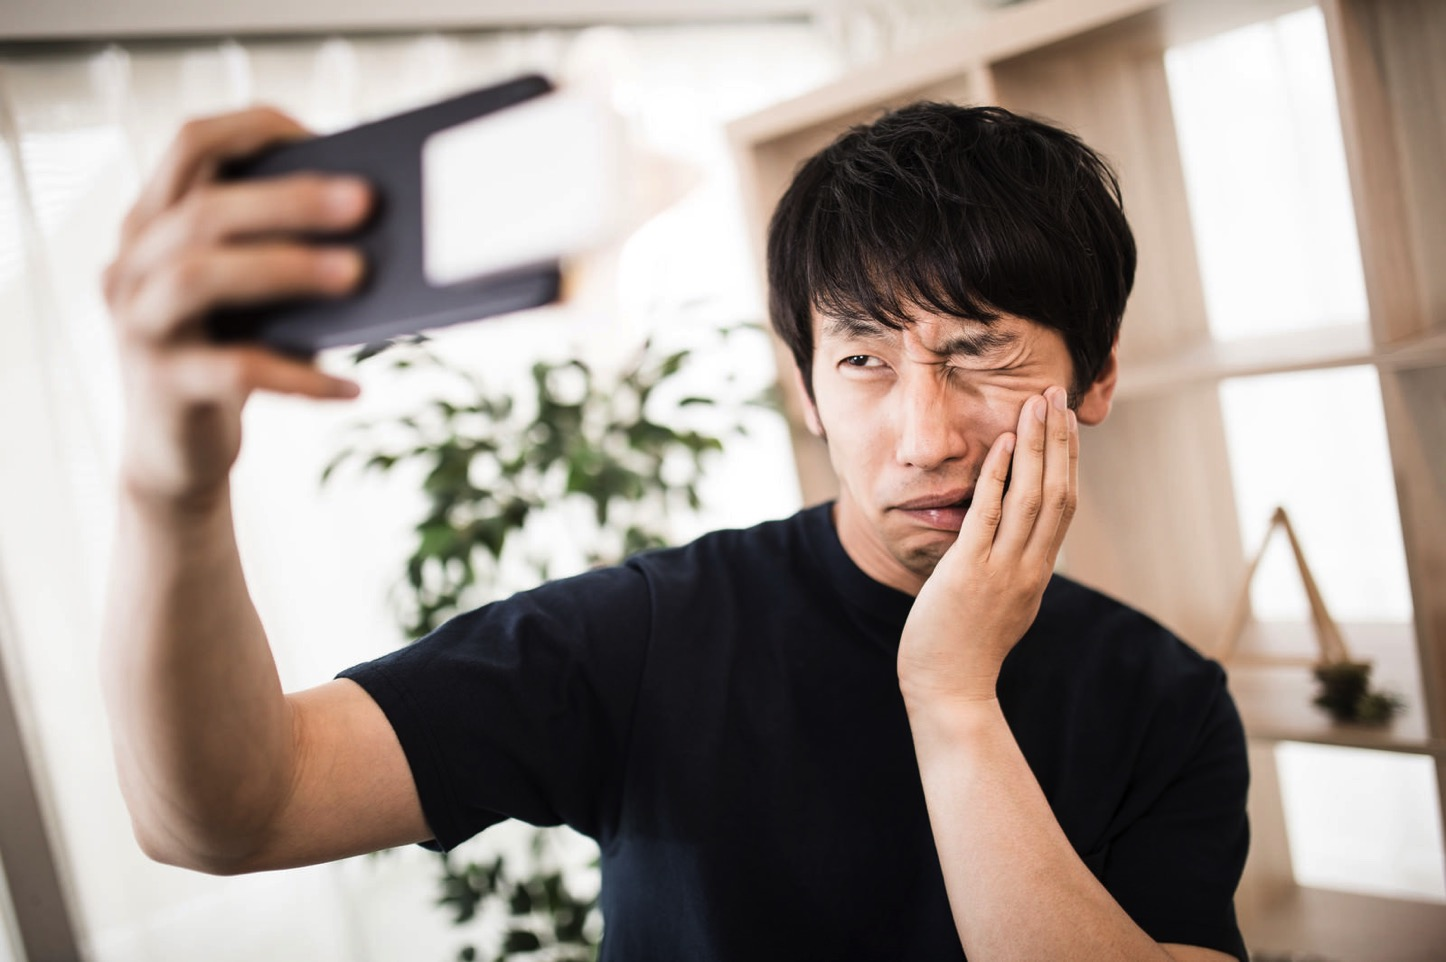 Selfie pakutaso ookawa